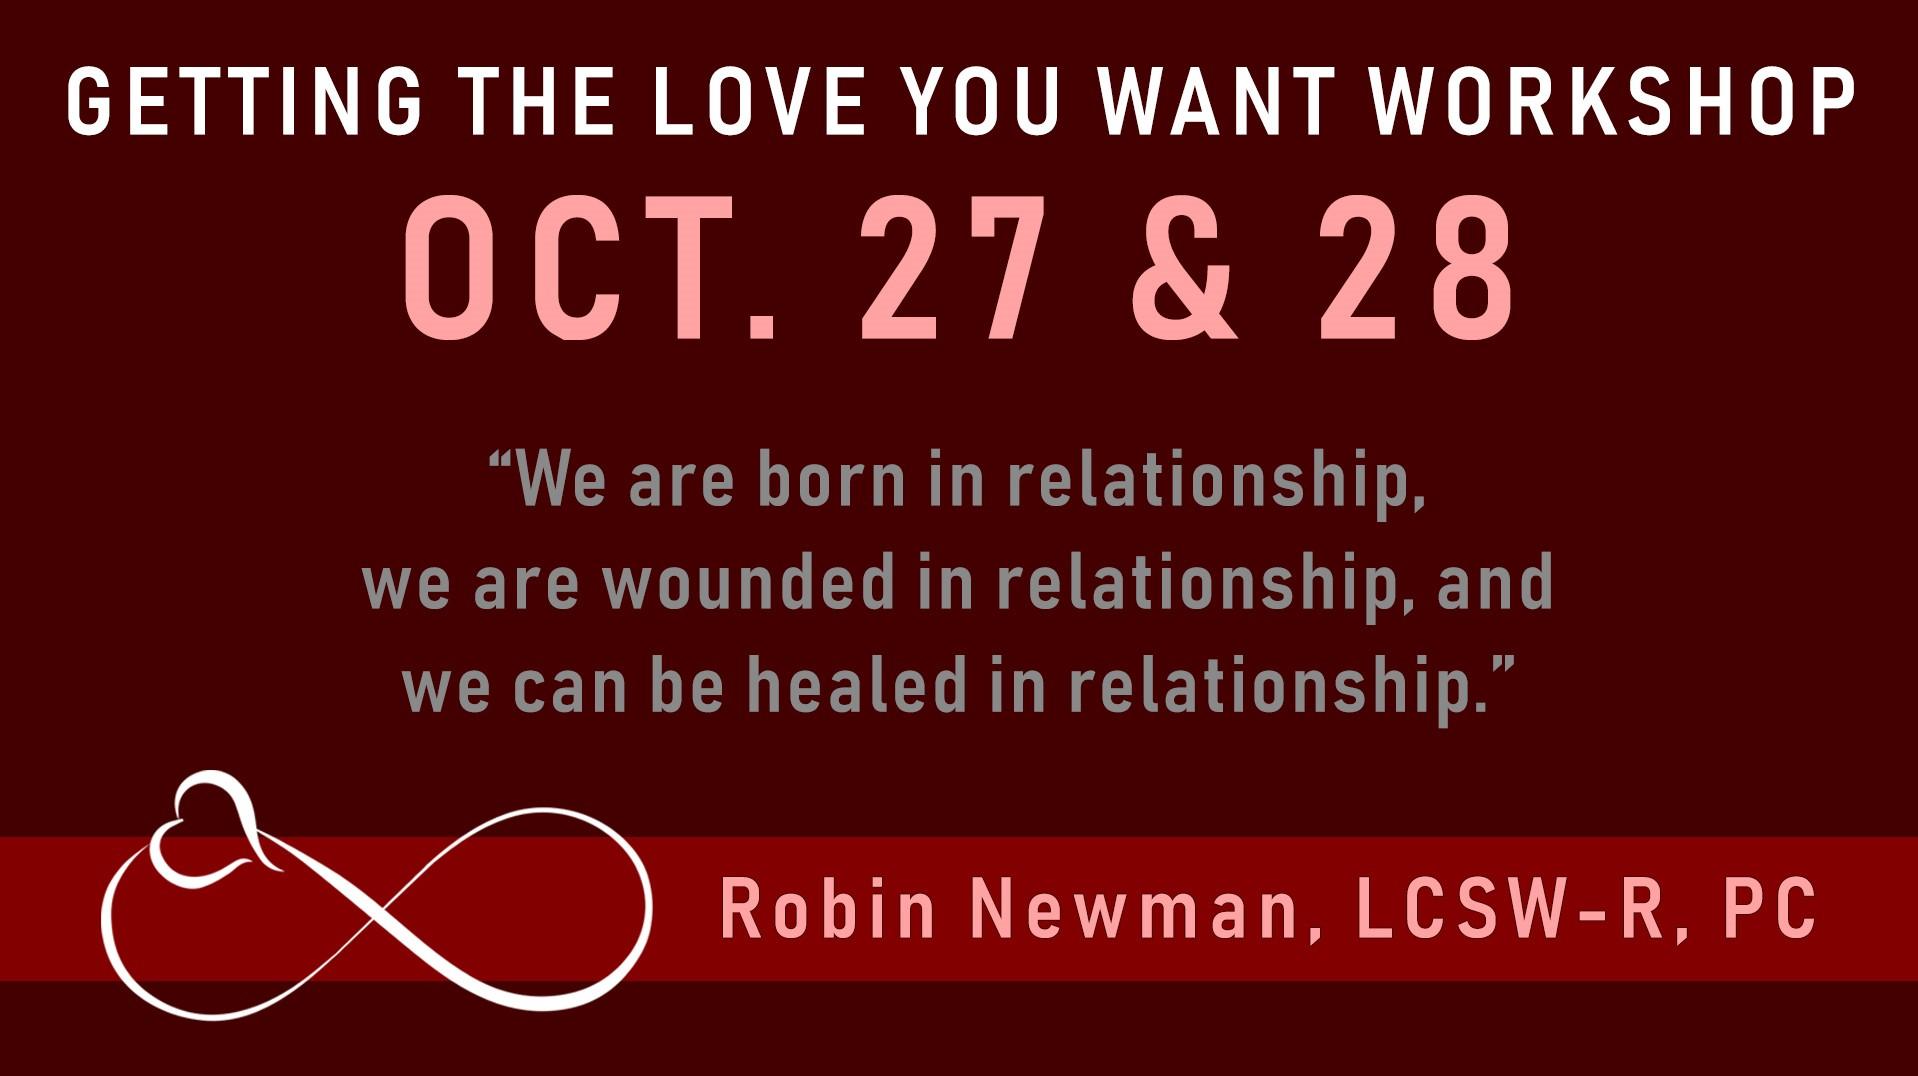 Long Island Couples Workshop October 2018